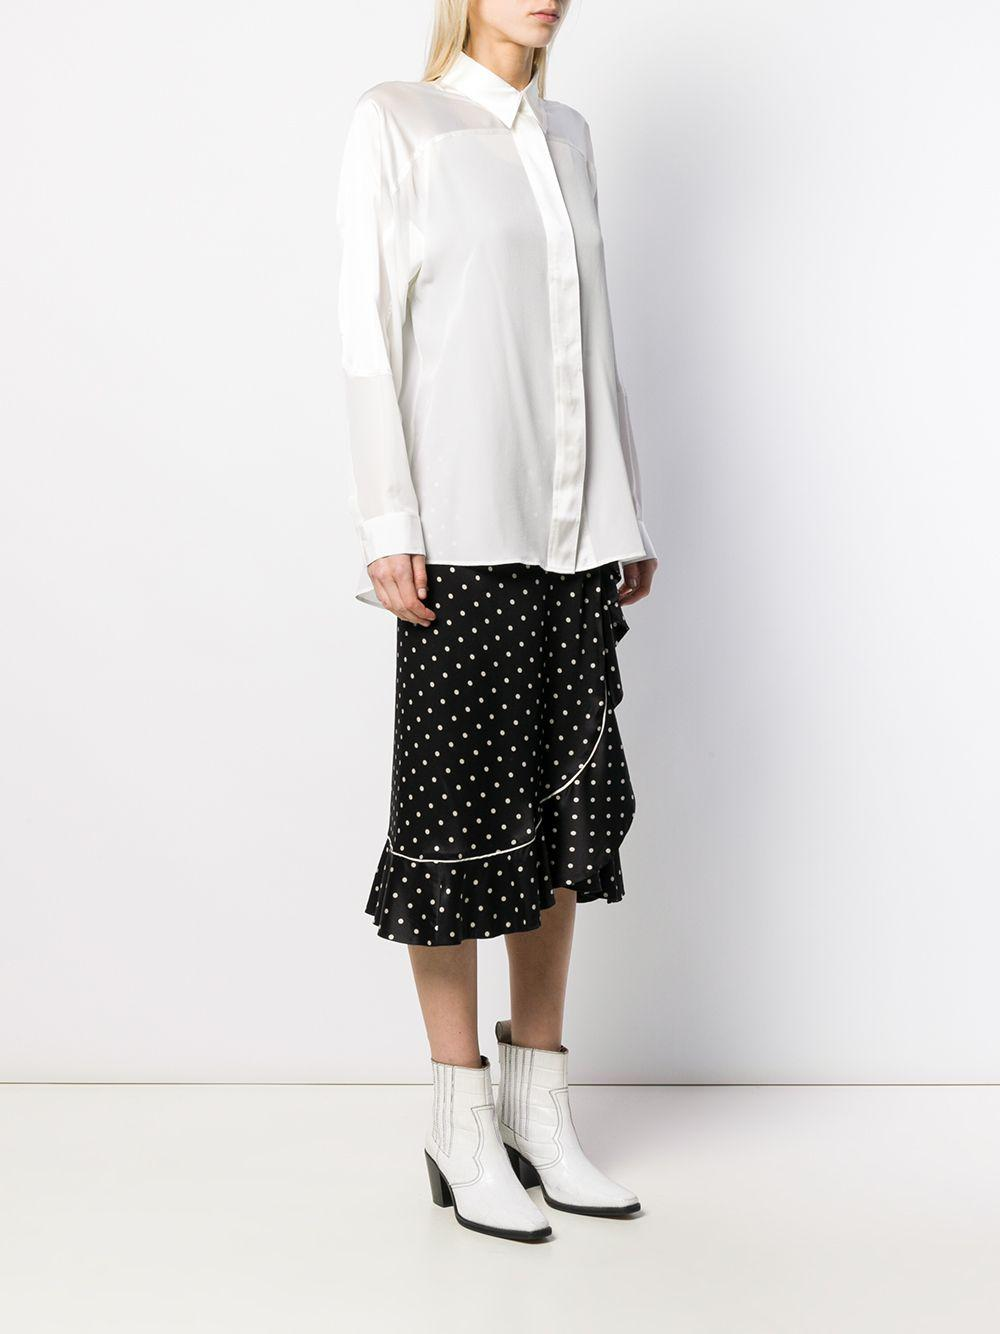 Chemise Pearl Soie Barbara Bui en coloris Blanc